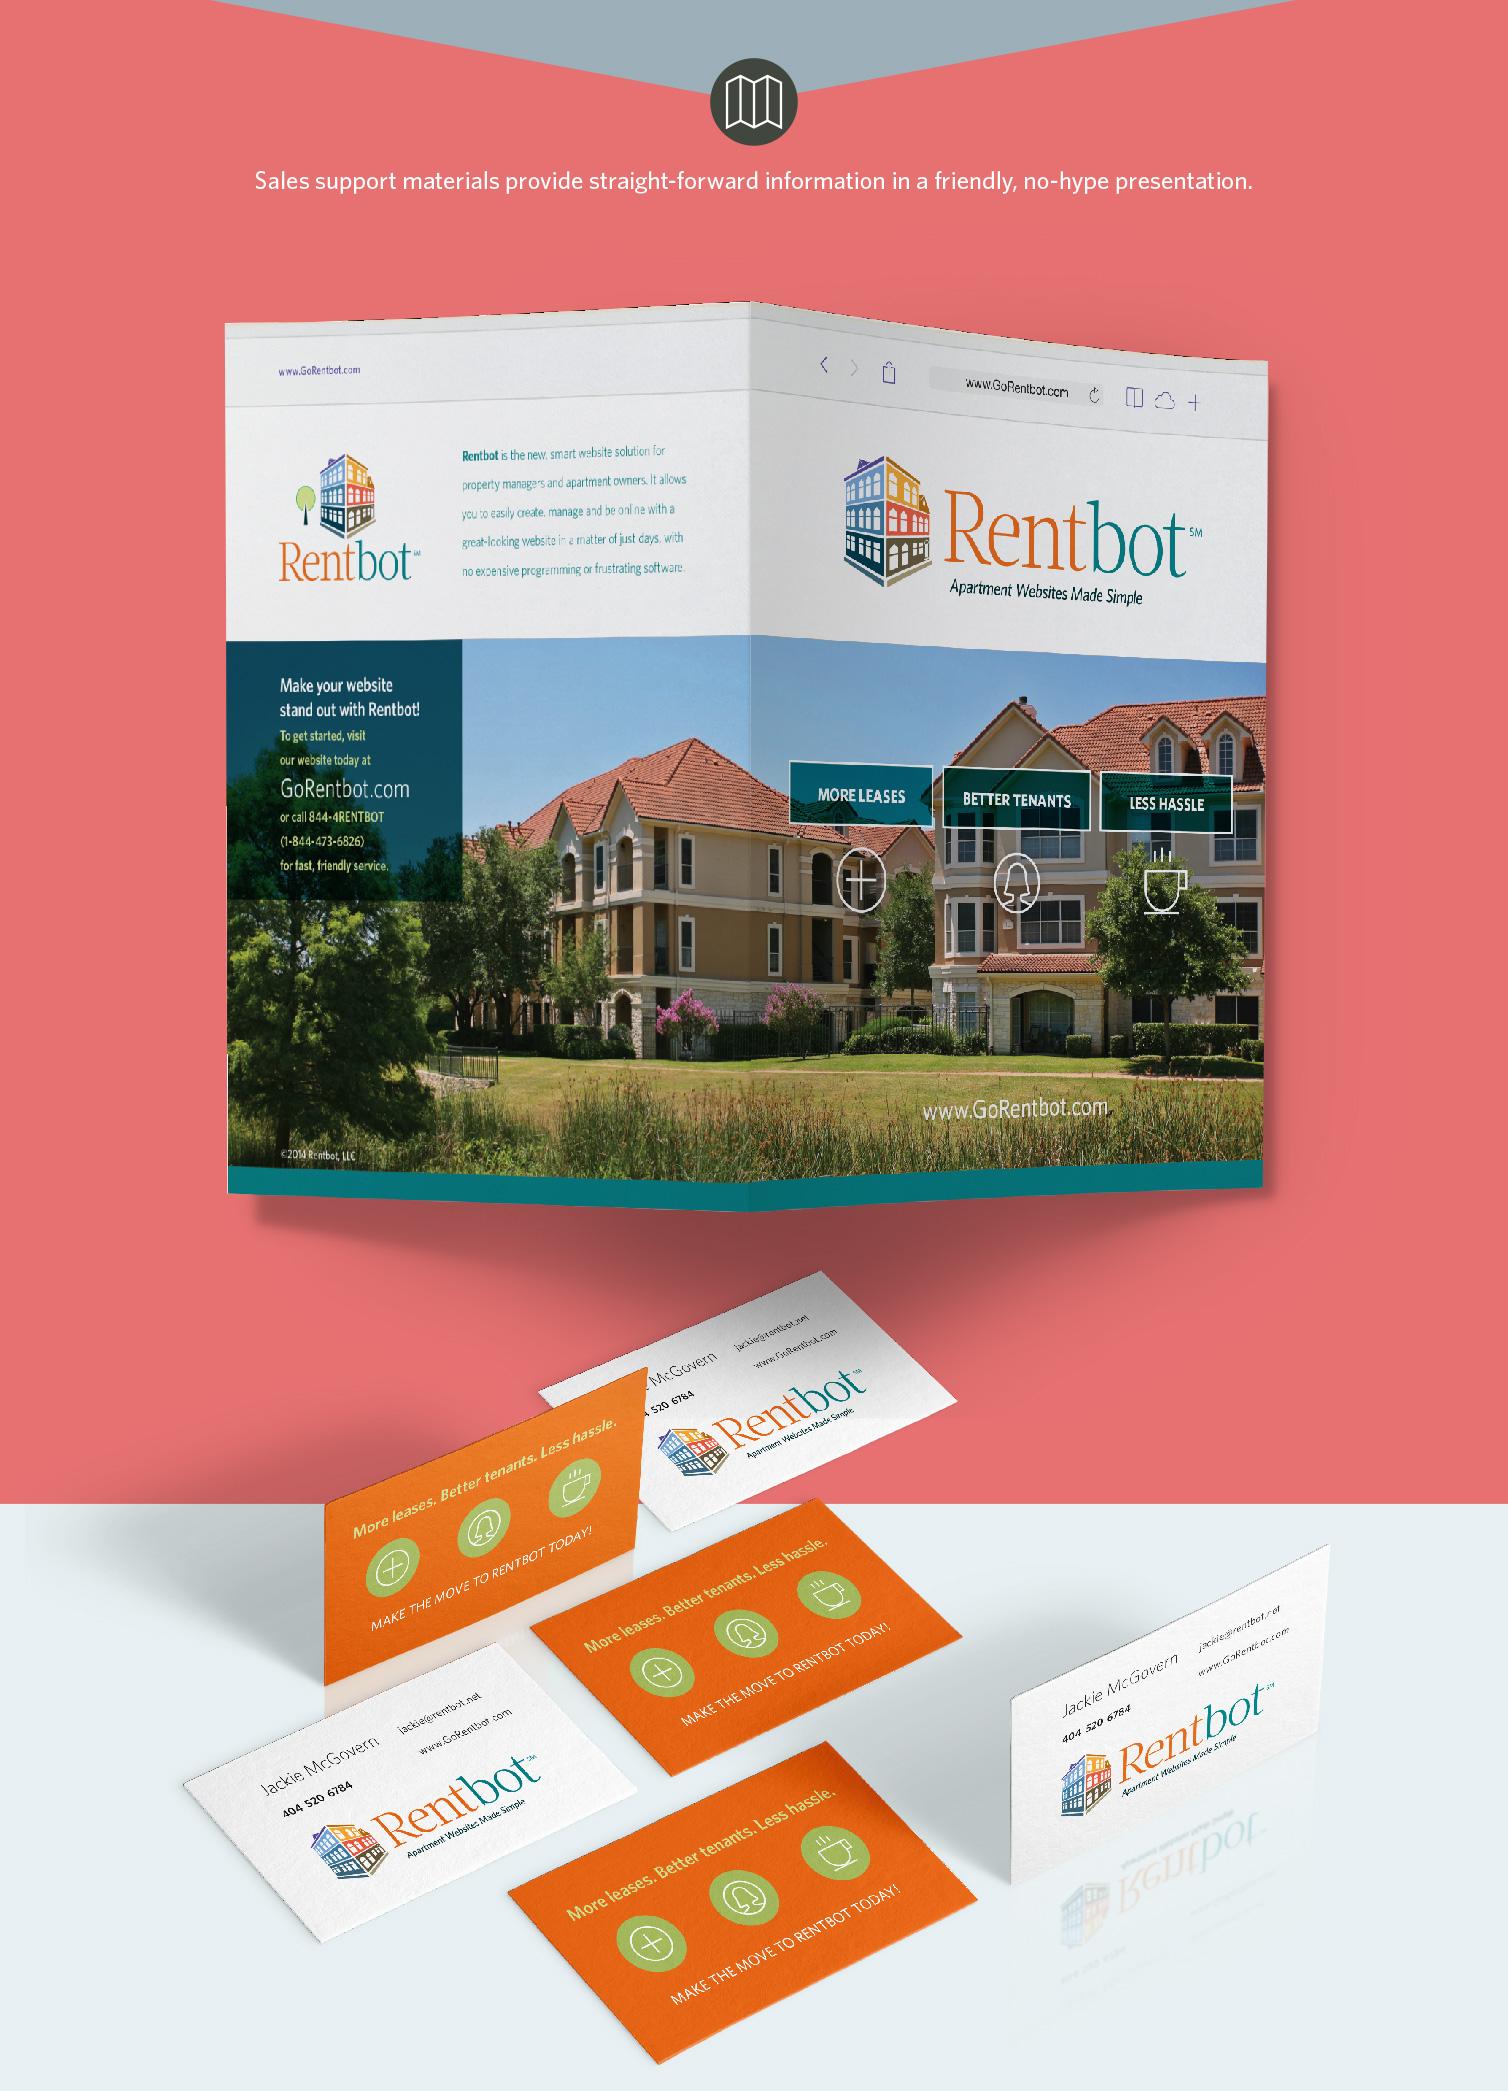 https://www.blt4design.com/wp-content/uploads/2015/02/rentbot13.jpg